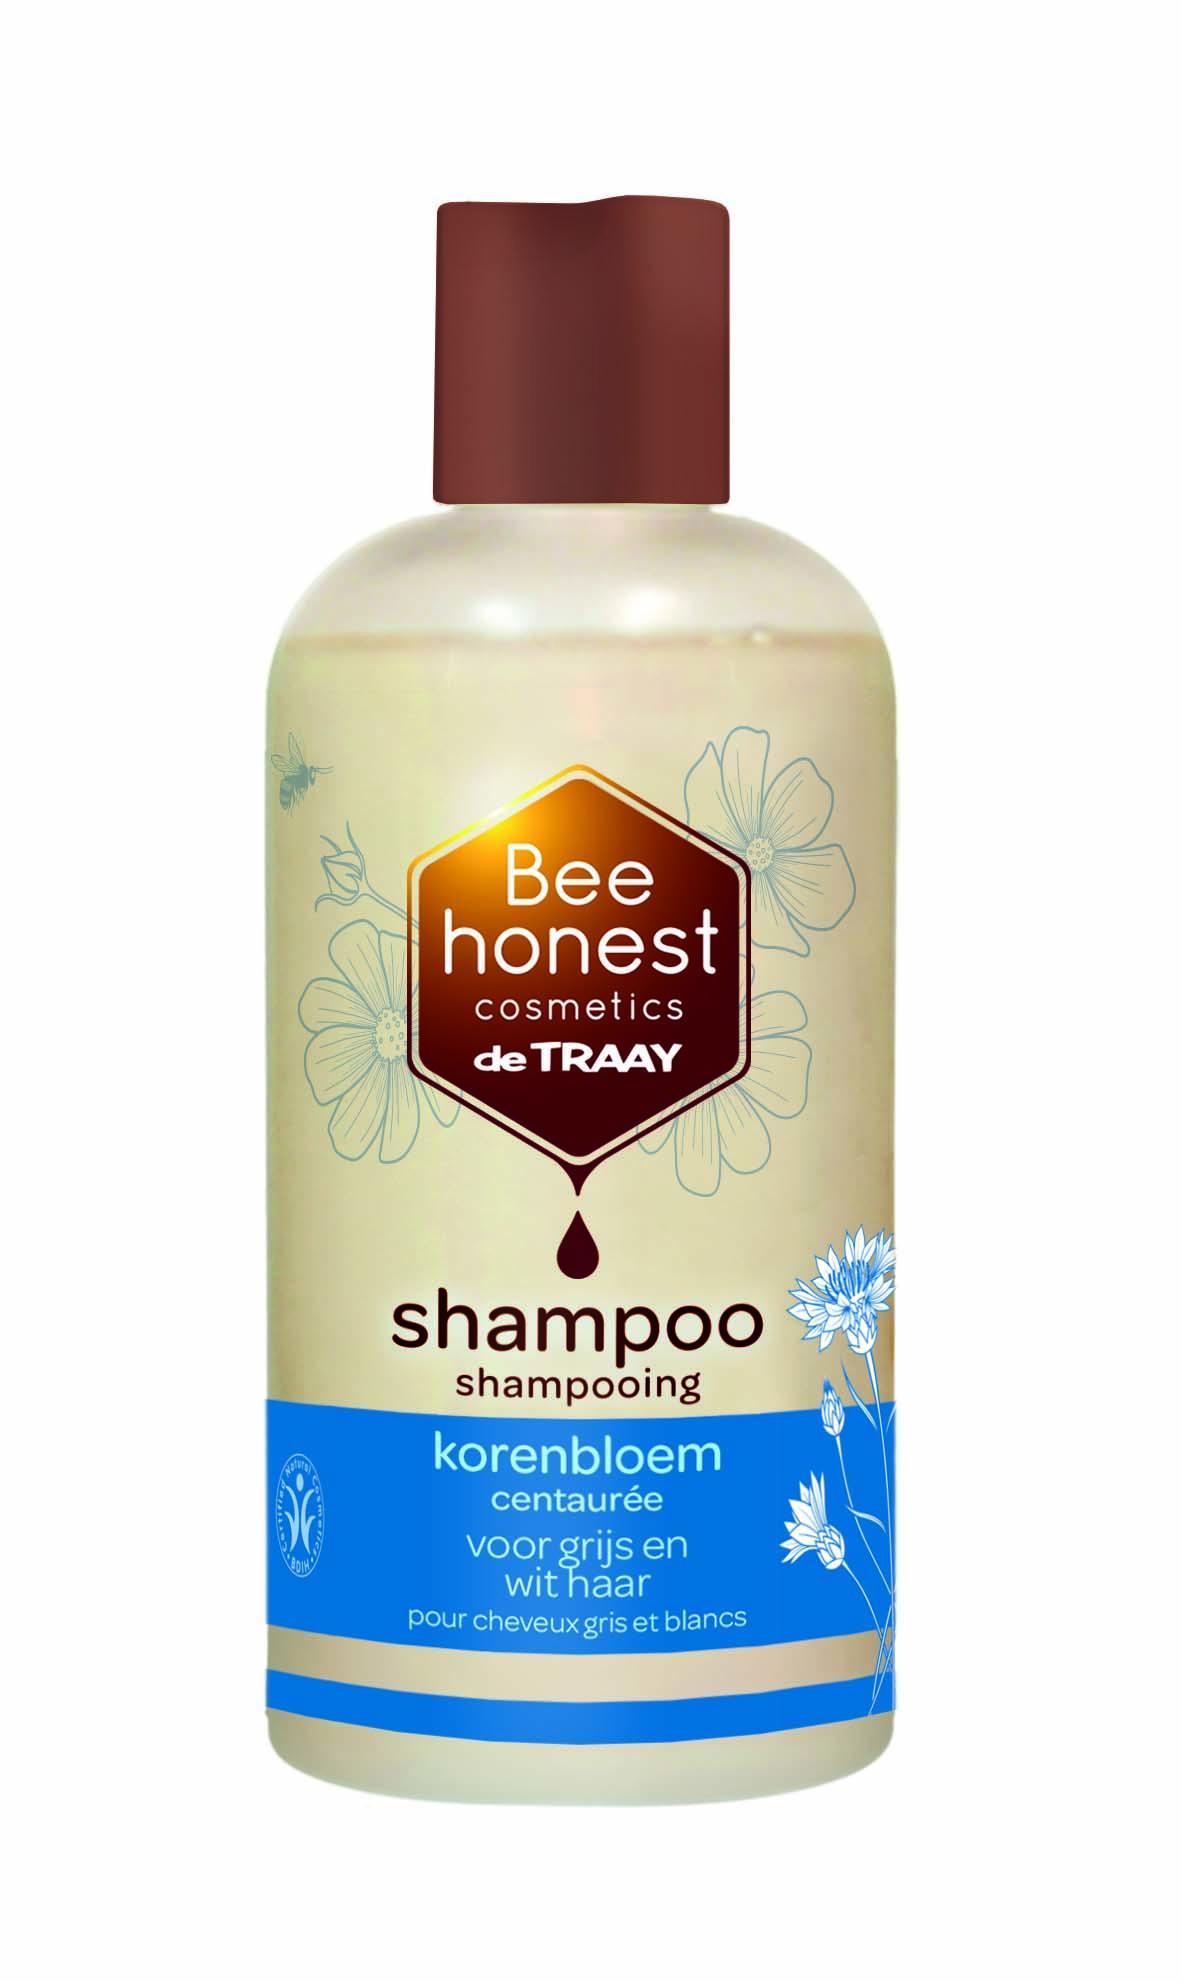 Shampoo cornflower